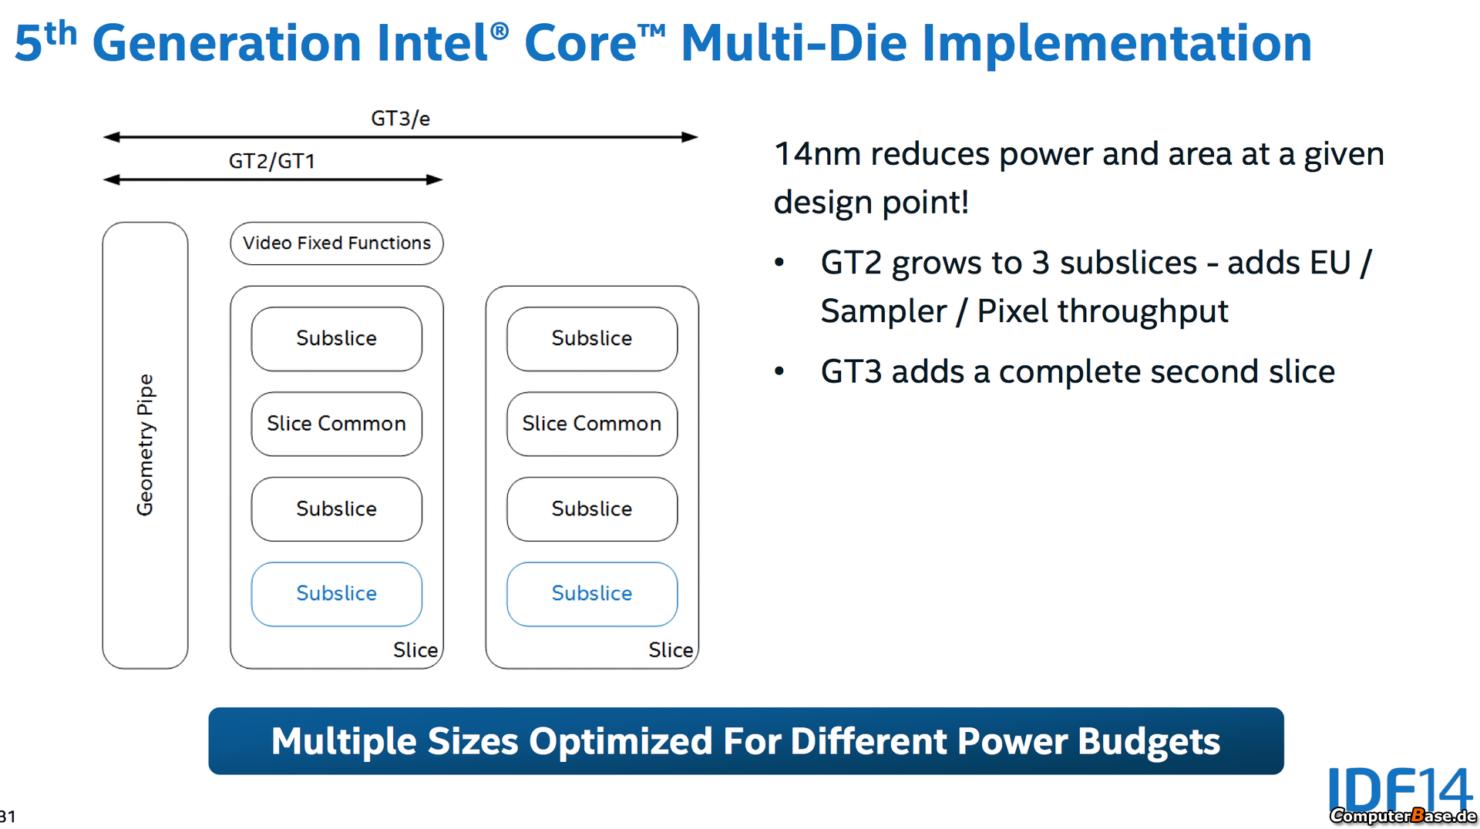 intel-5th-generation-gpu-core